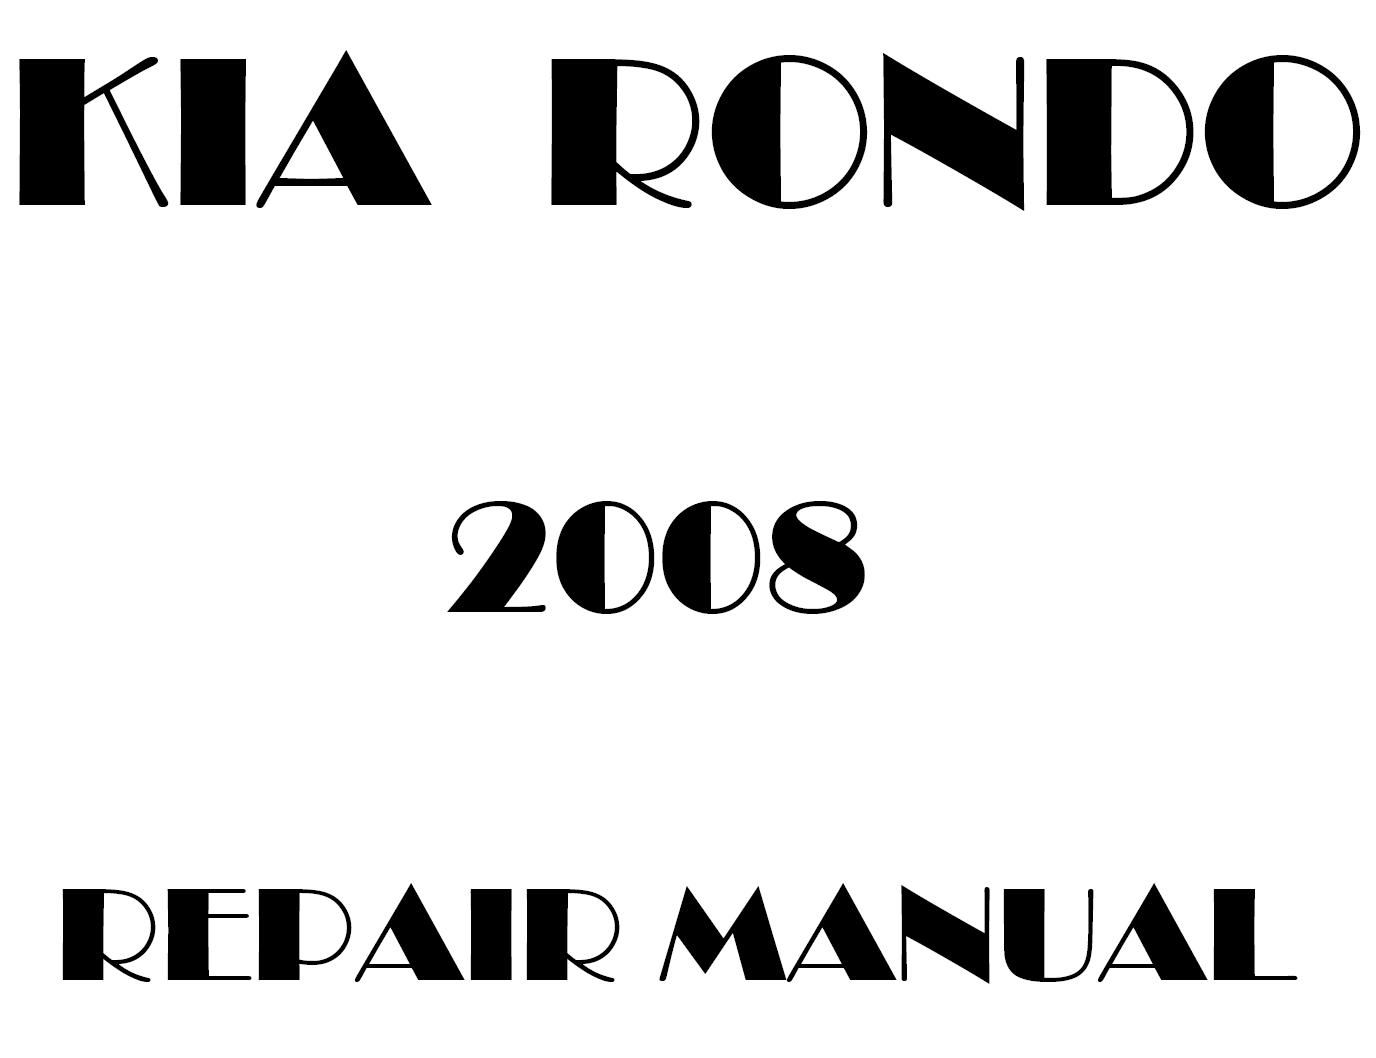 2008 Kia Rondo repair manual